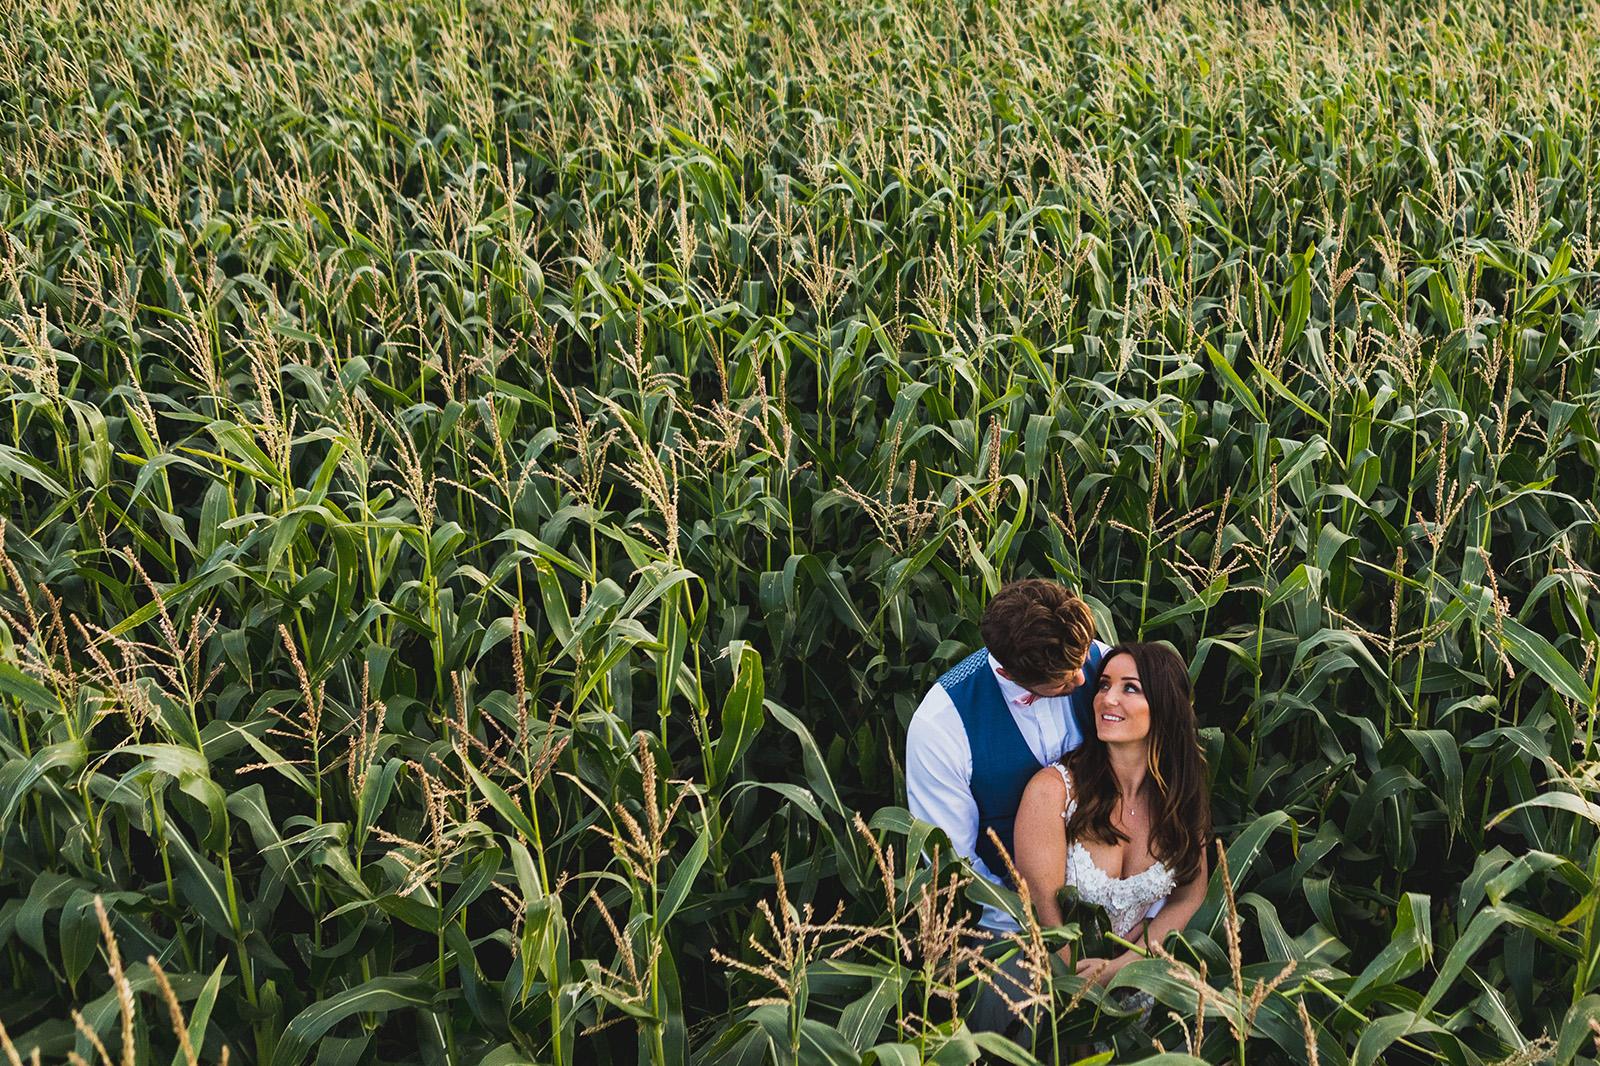 Boho wedding photography Cardiff South Wales - Boho wedding Llantwit Major